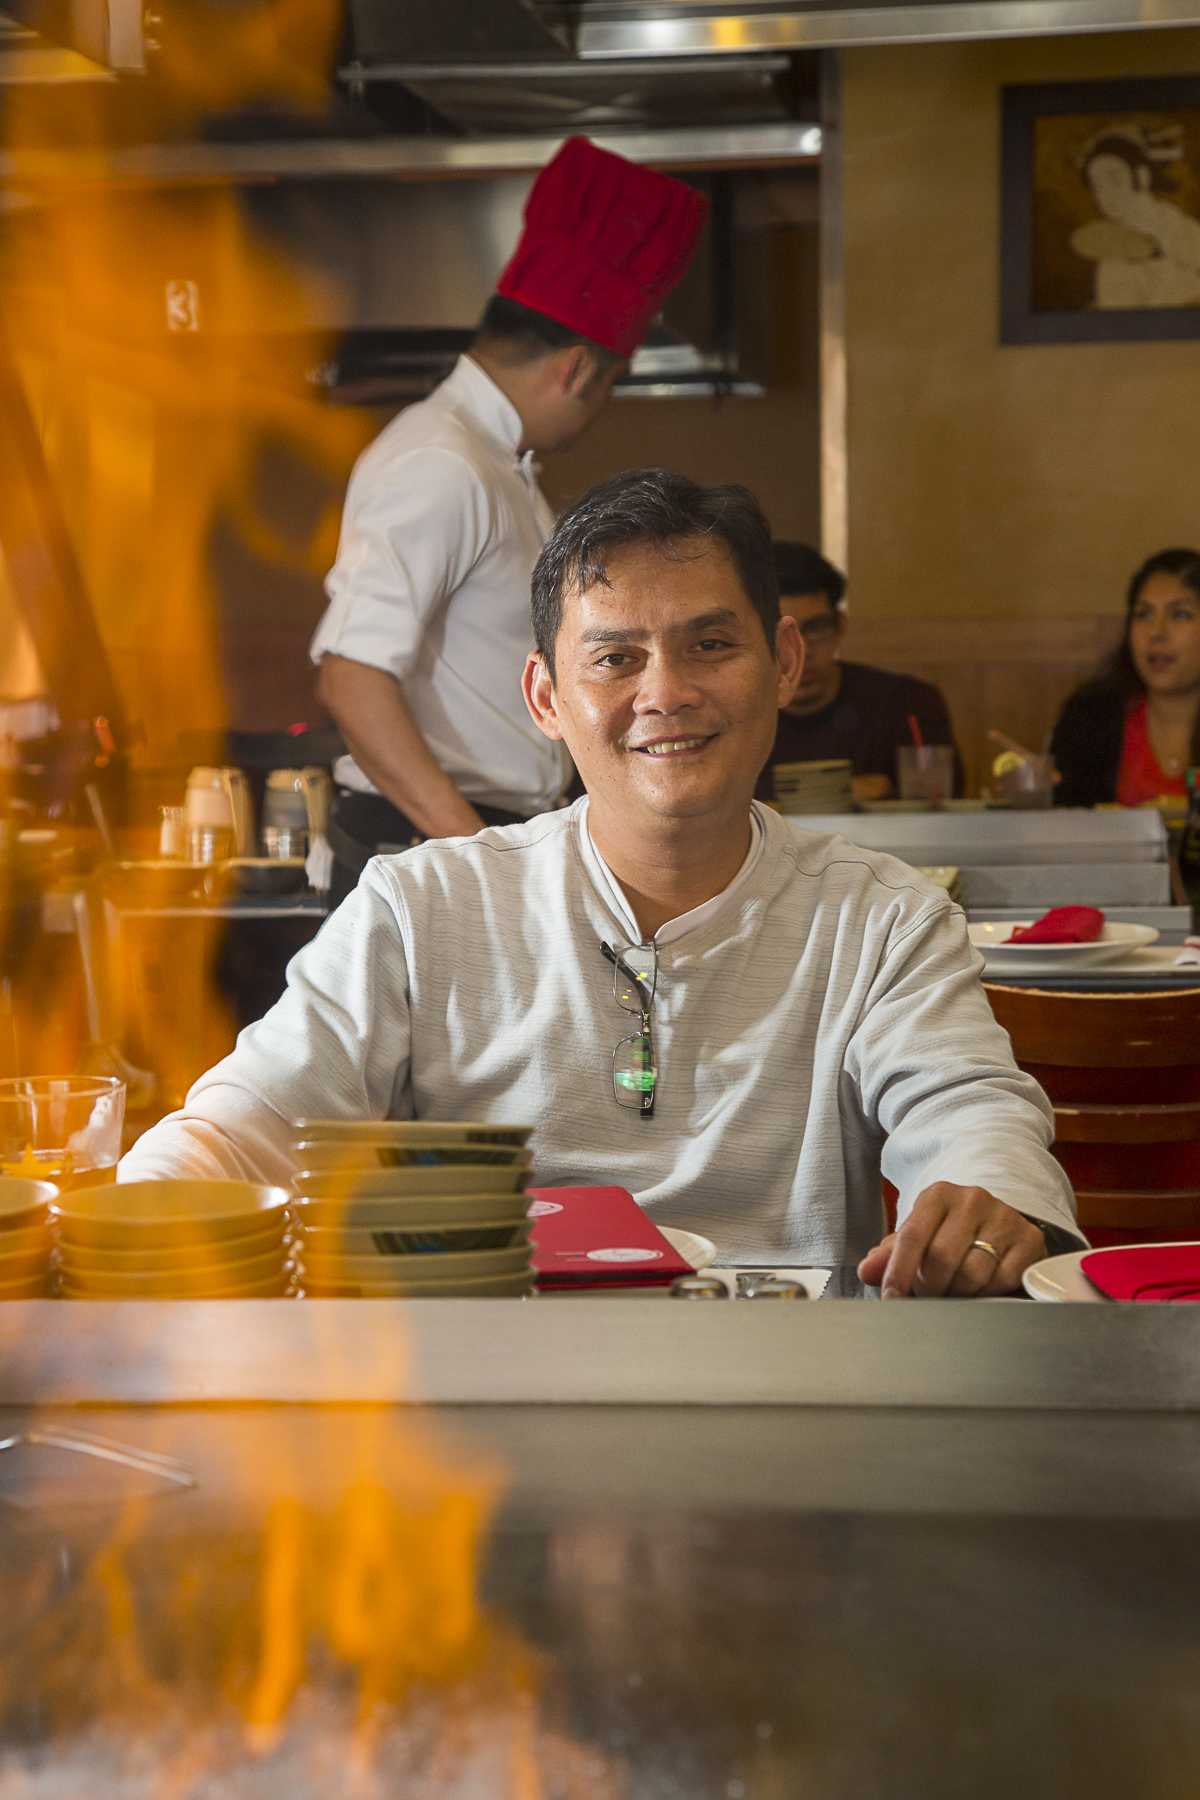 Tim Vu, part owner and original chef at Sakura Teppanyaki & Sushi